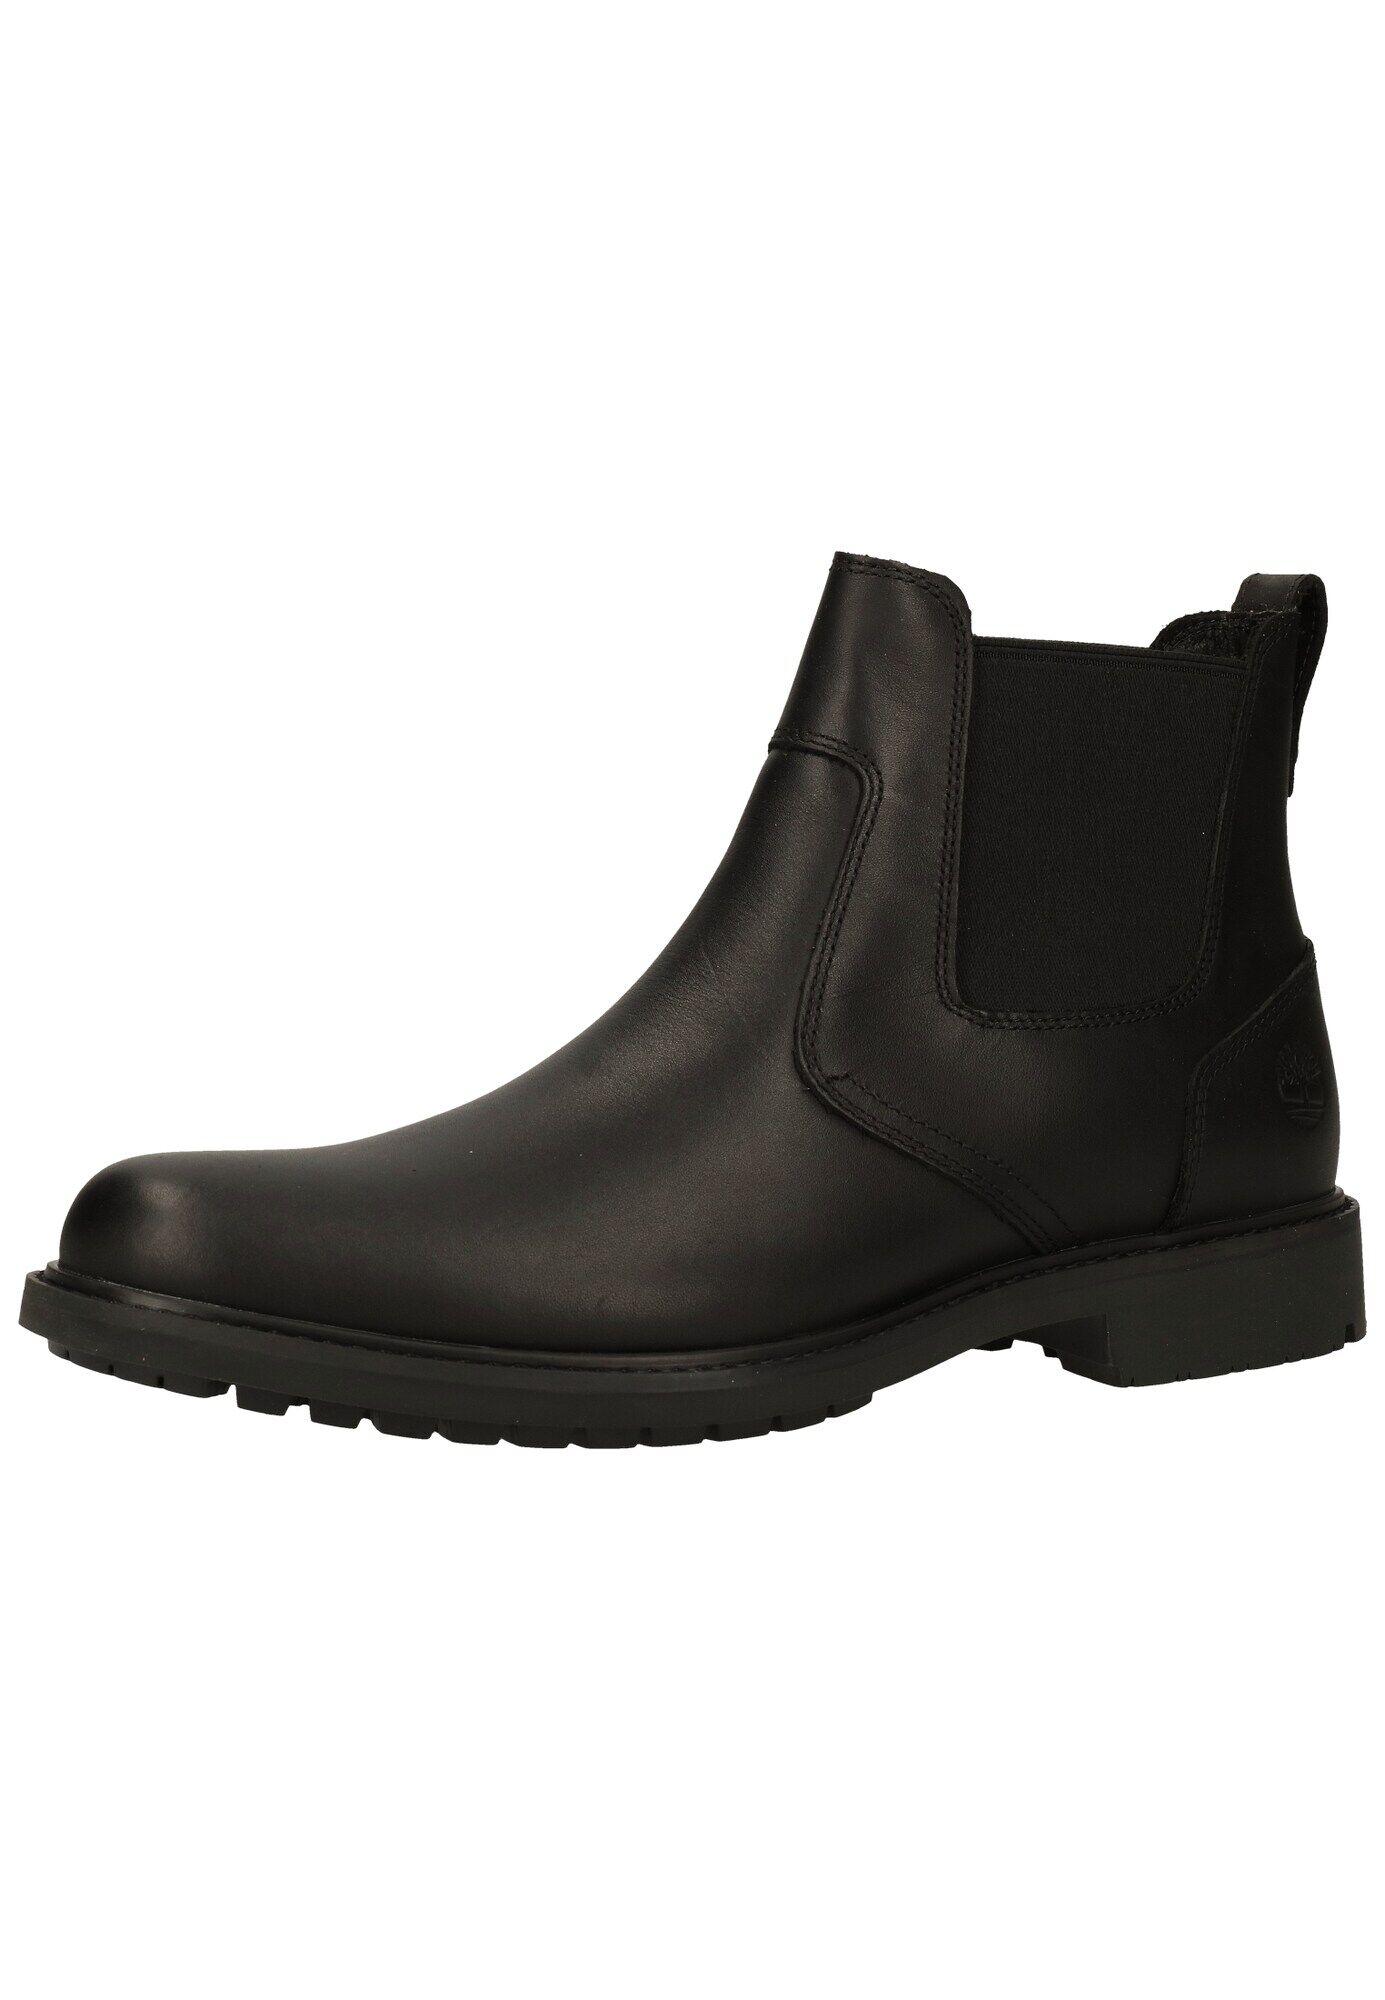 TIMBERLAND Boots chelsea Nero